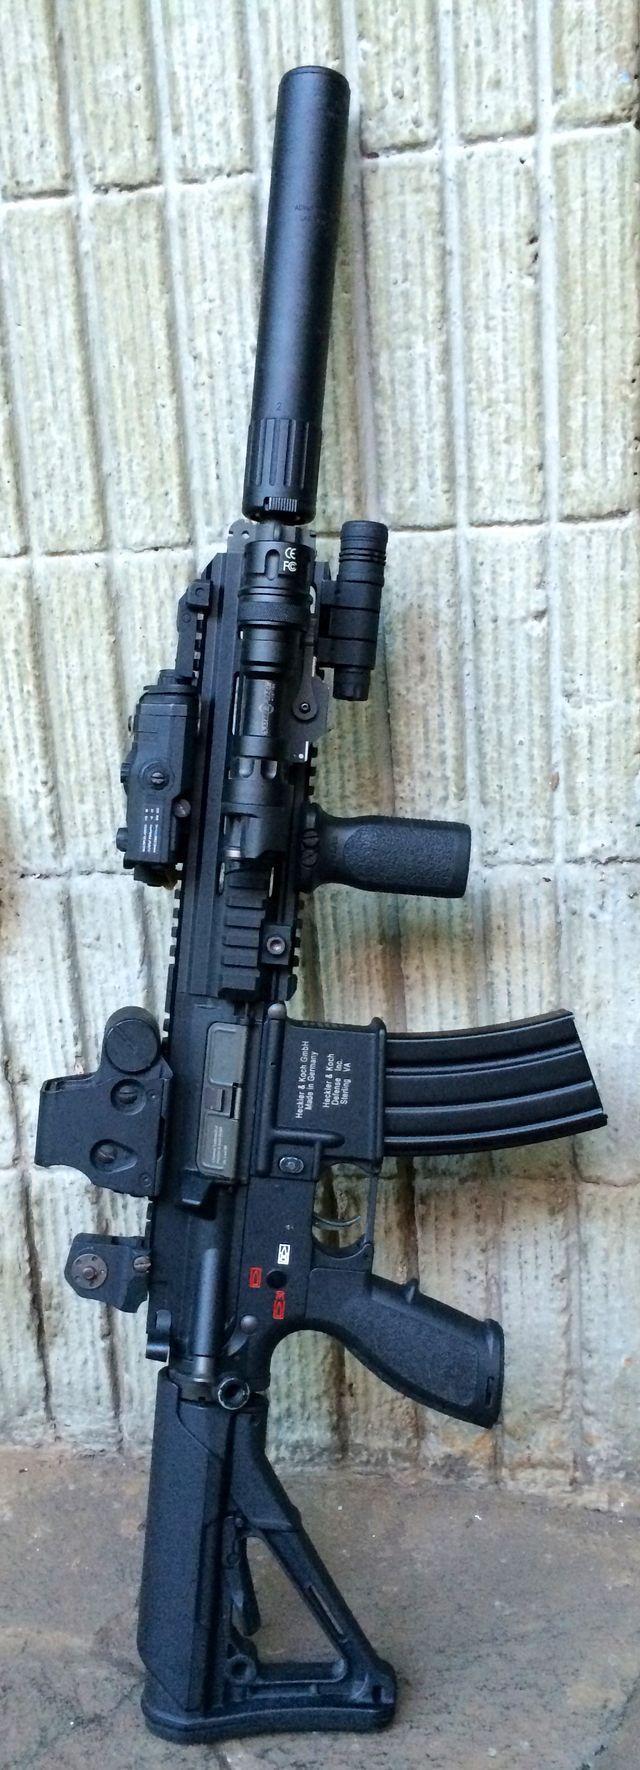 HK 416 DEVGRU AAC SPR SILENCER ...Hellllllo gorgeous!